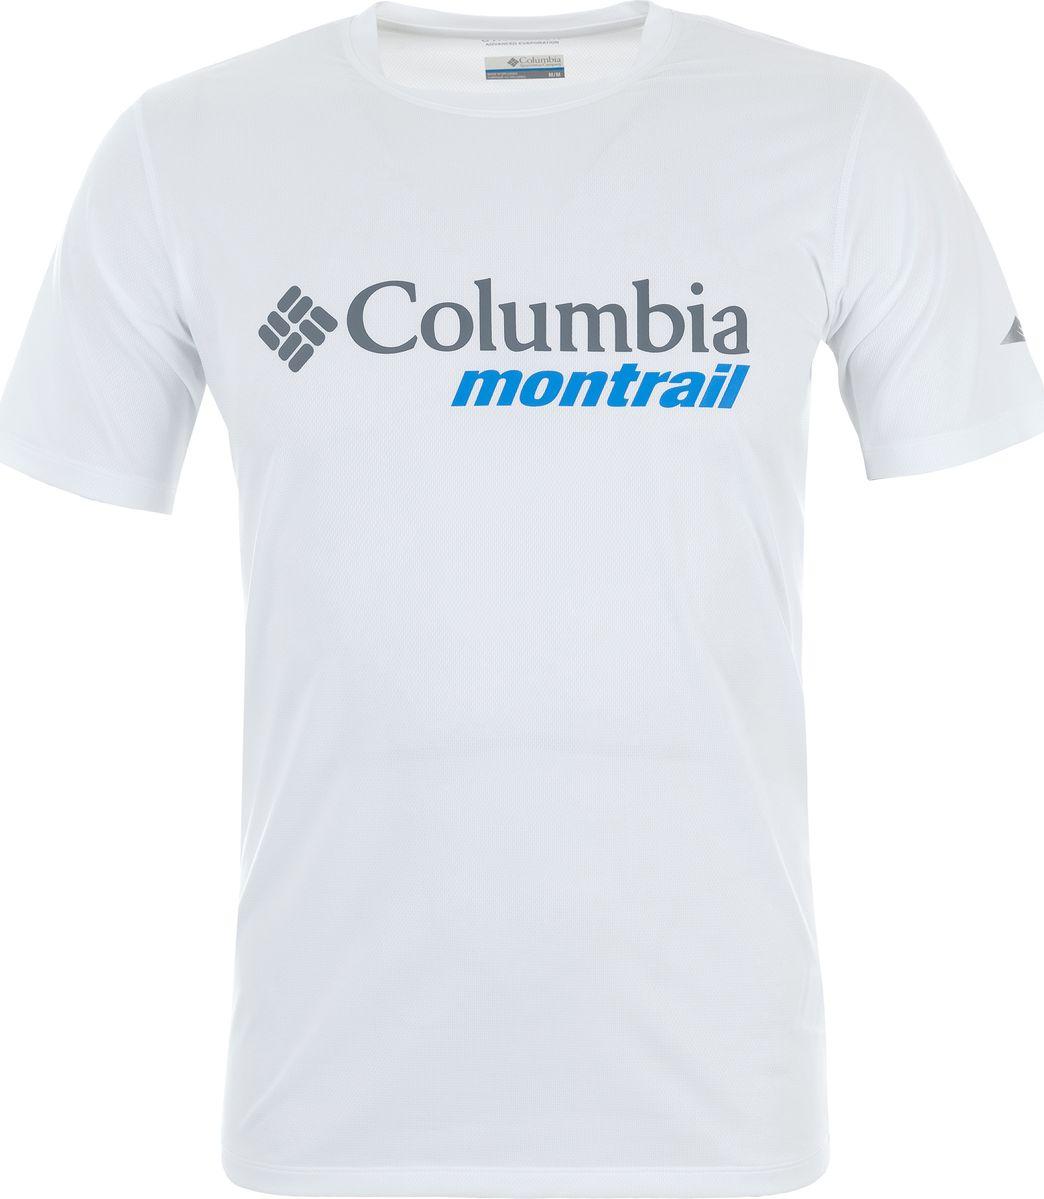 Купить Футболка мужская Columbia Trinity Trail Tee, цвет: белый. 1759211-102. Размер S (44/46)